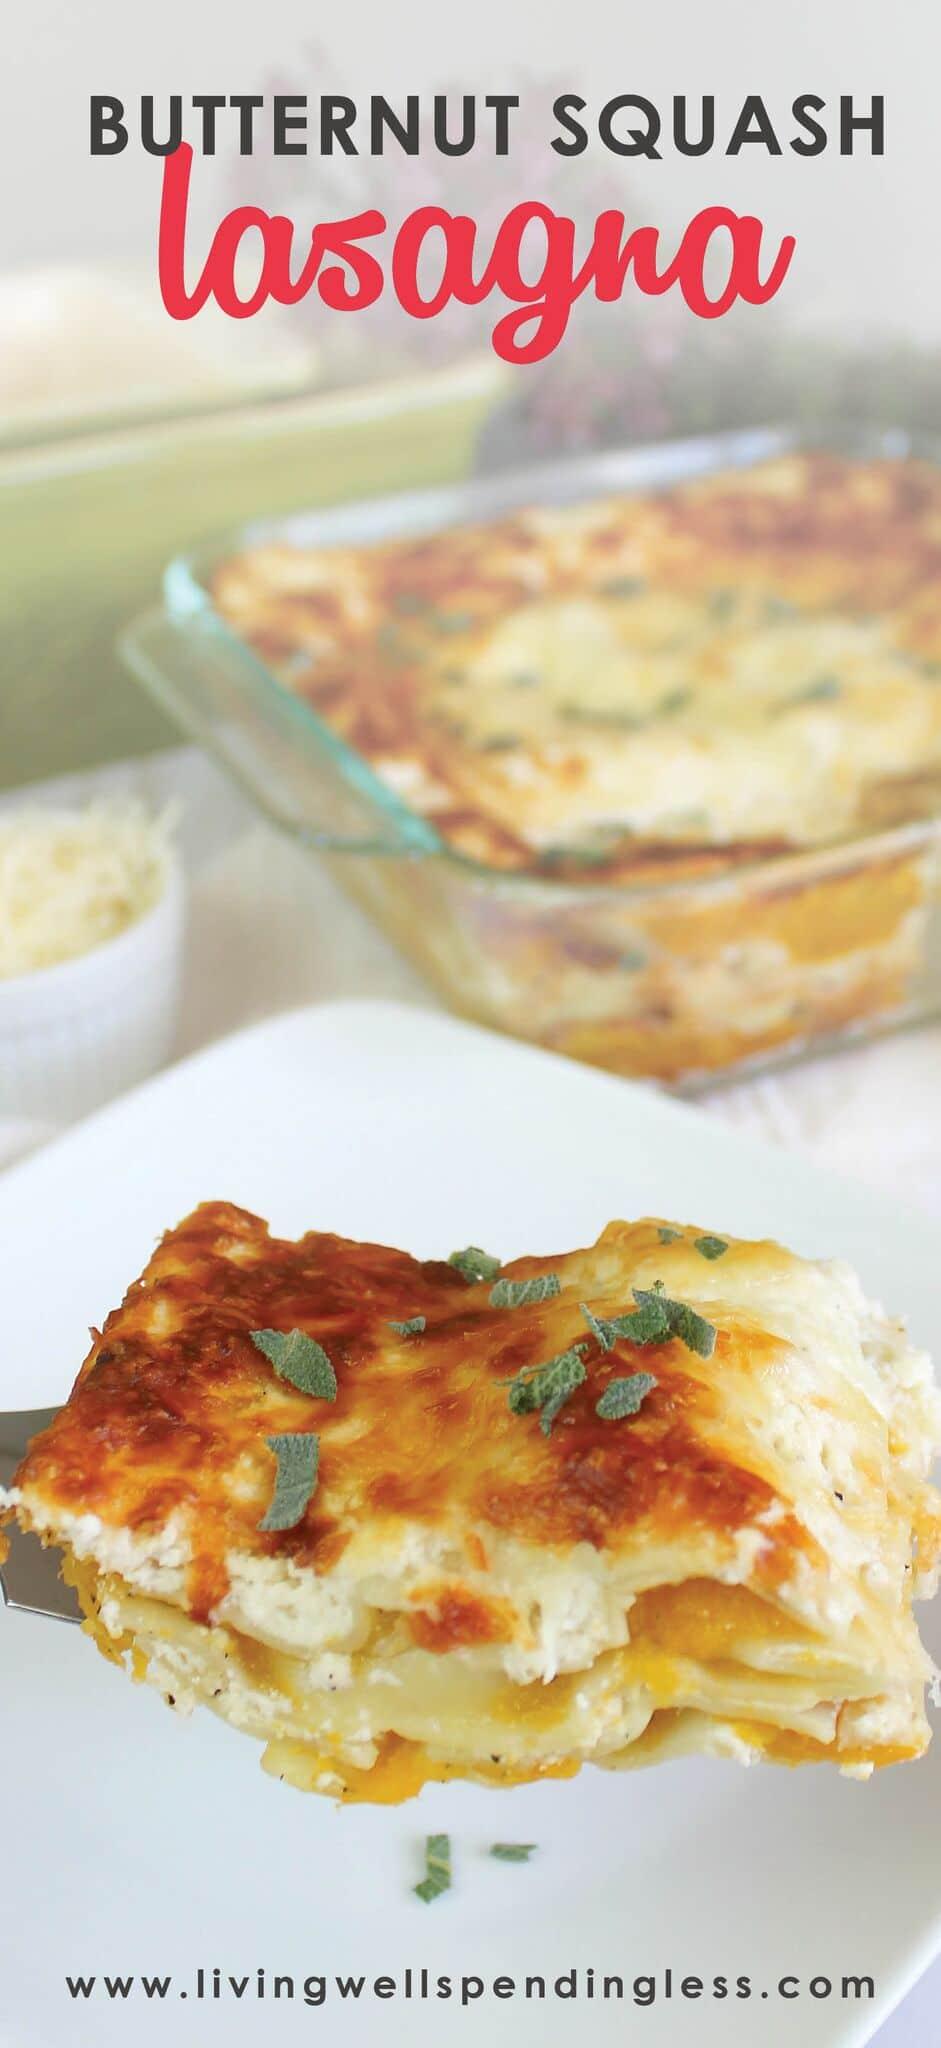 Butternut Squash Lasagna: An easy dinner recipe you'll love!